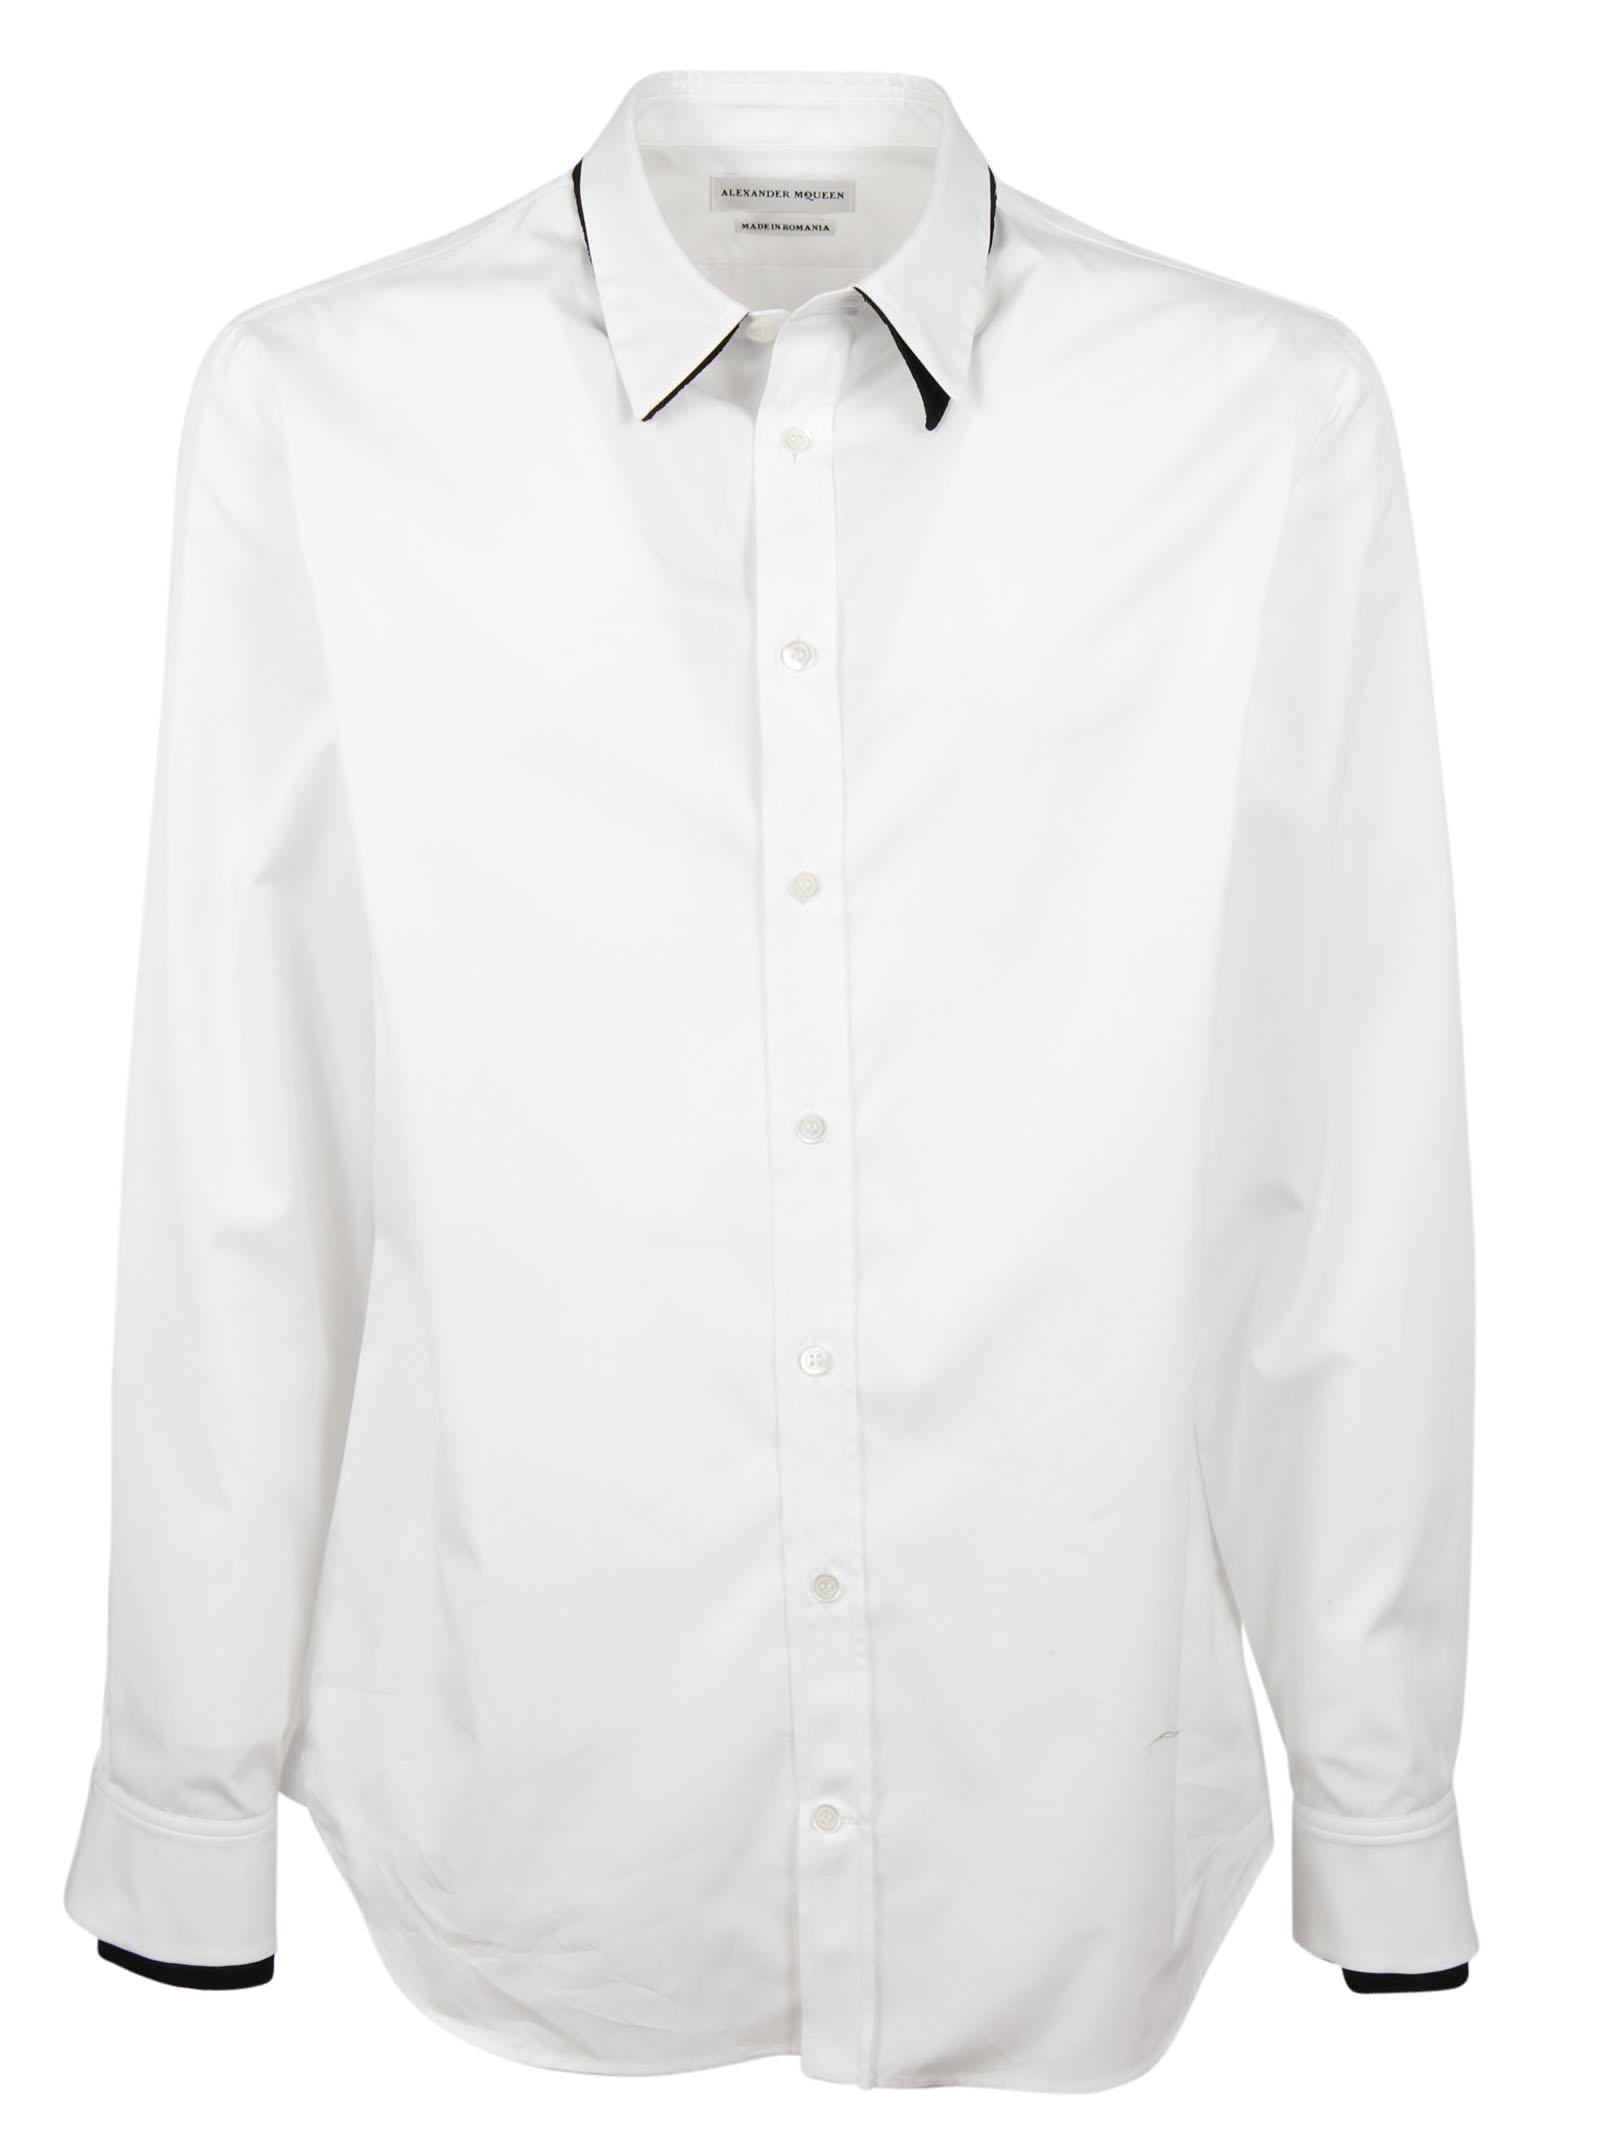 Alexander McQueen Alexander McQueen Double Collar Shirt